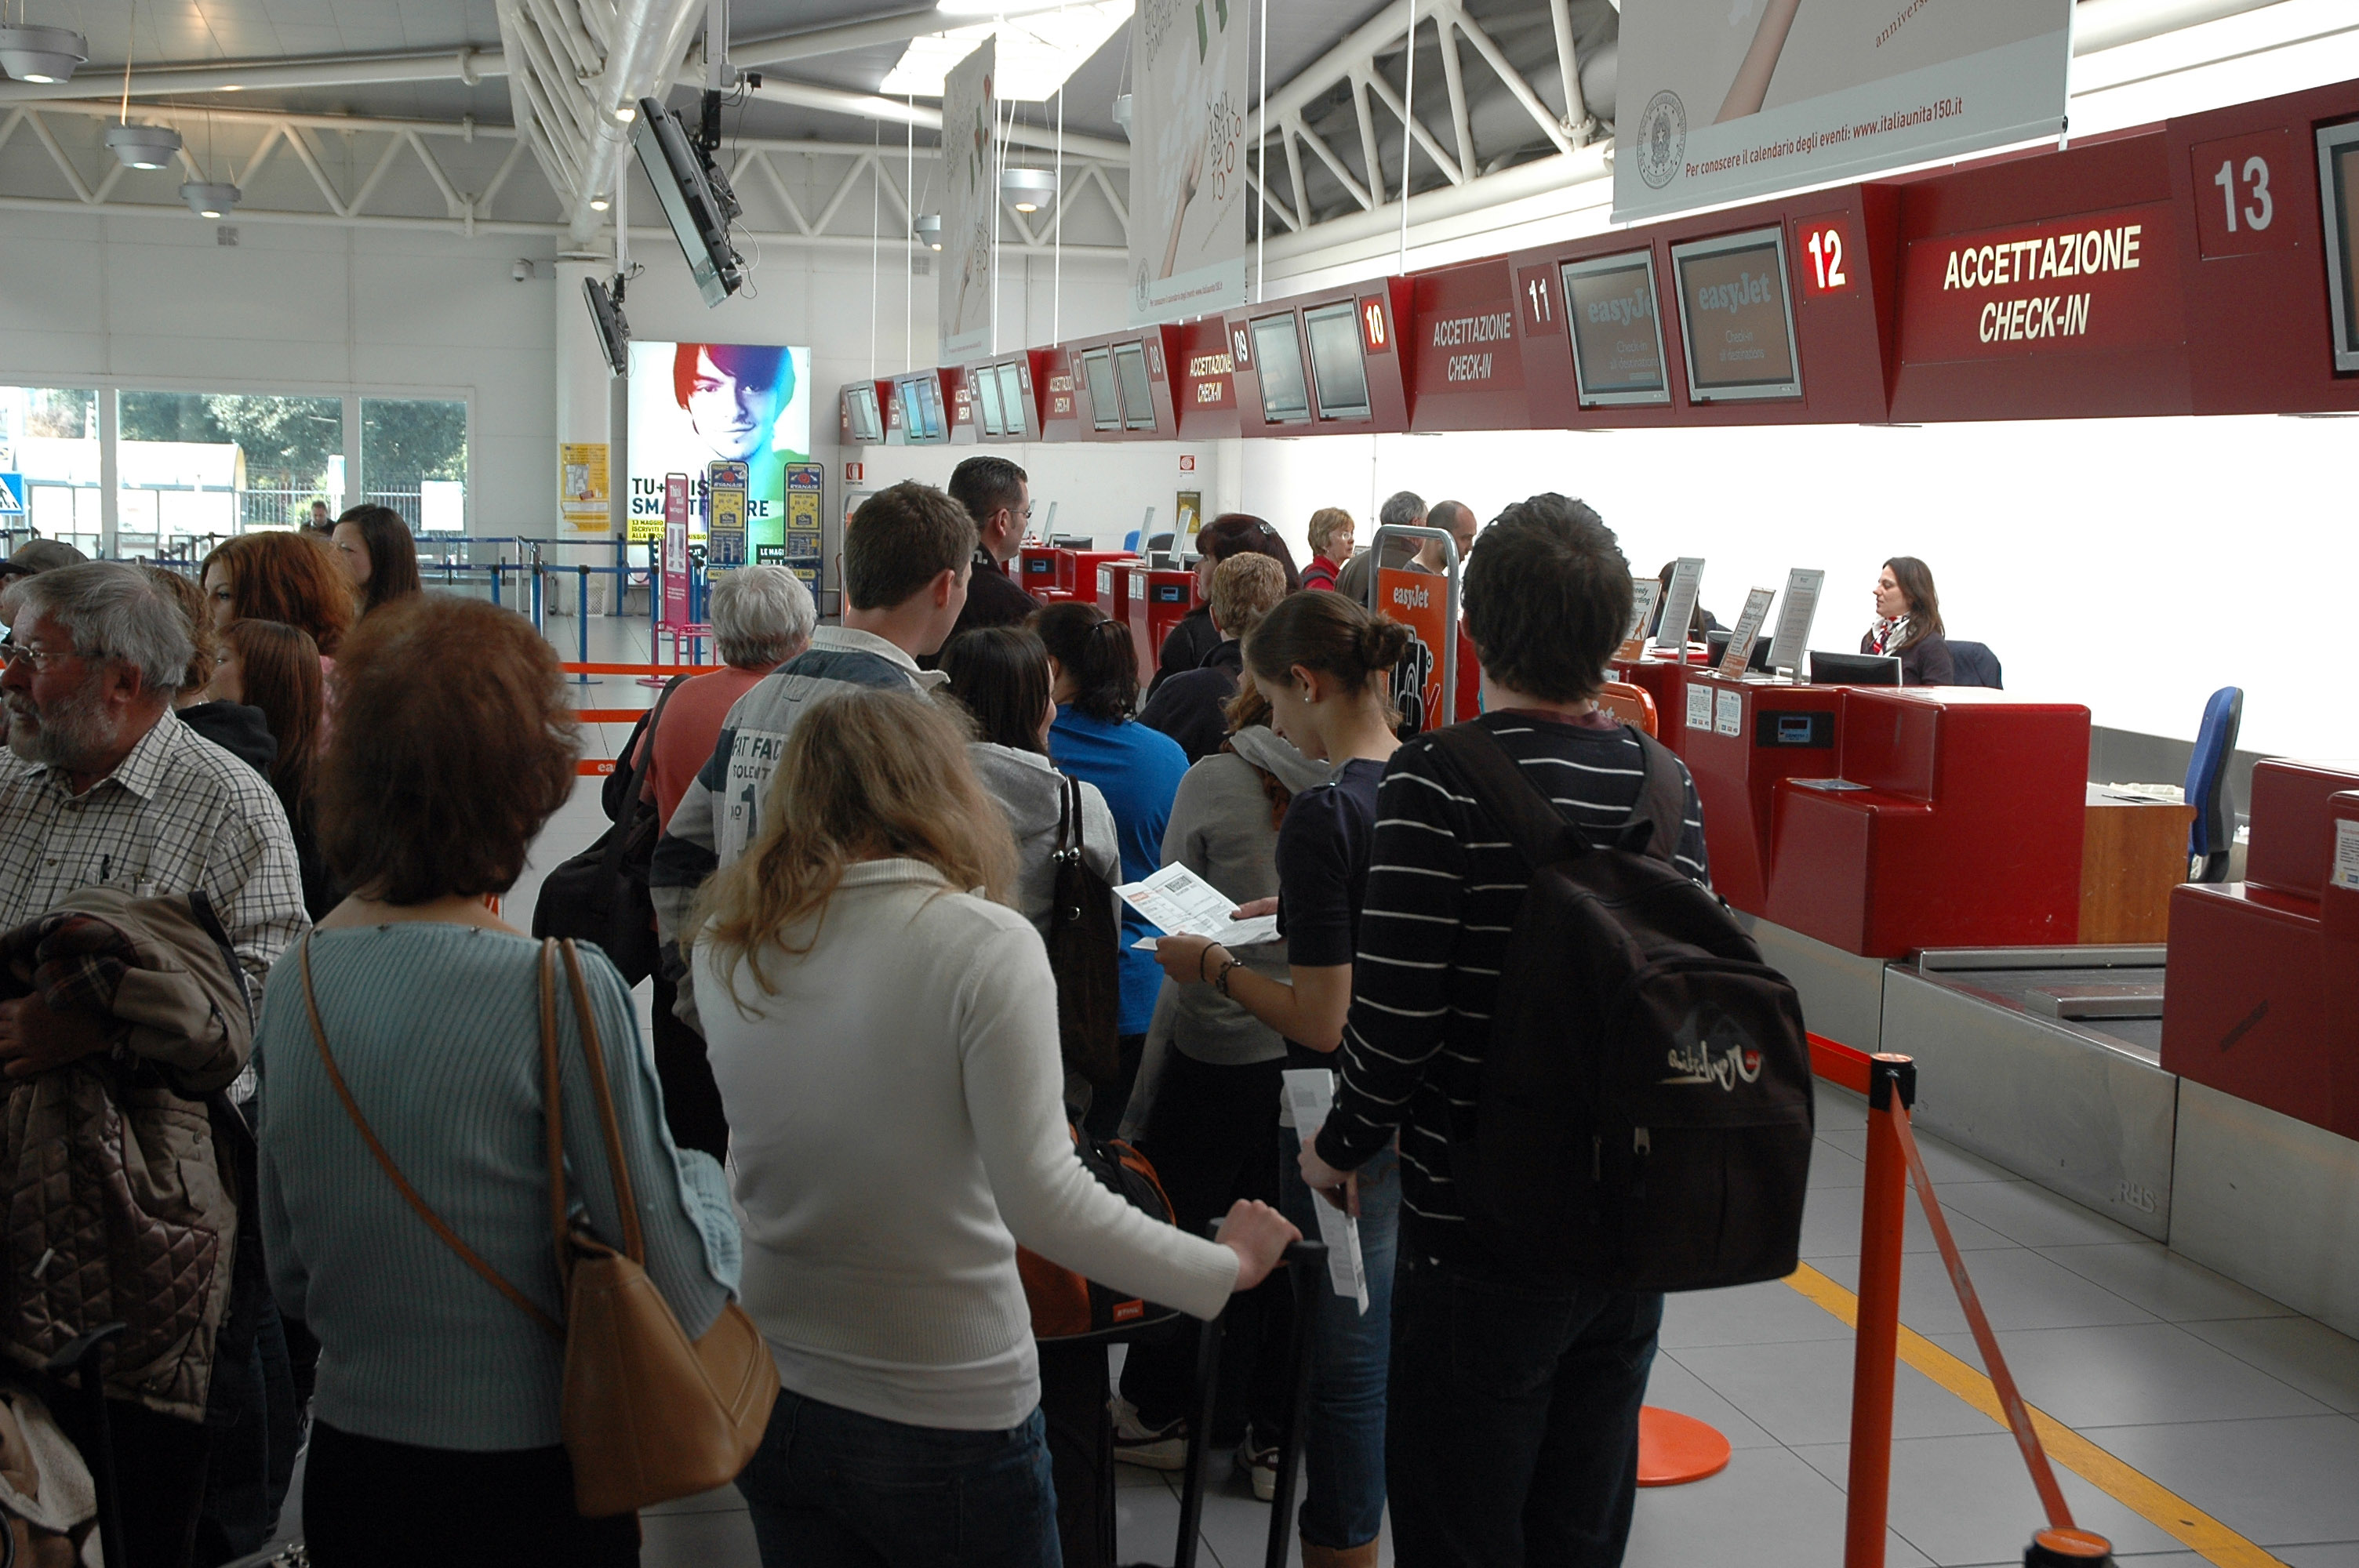 Photosi Calendario.Photo Gallery Aeroporti Di Roma